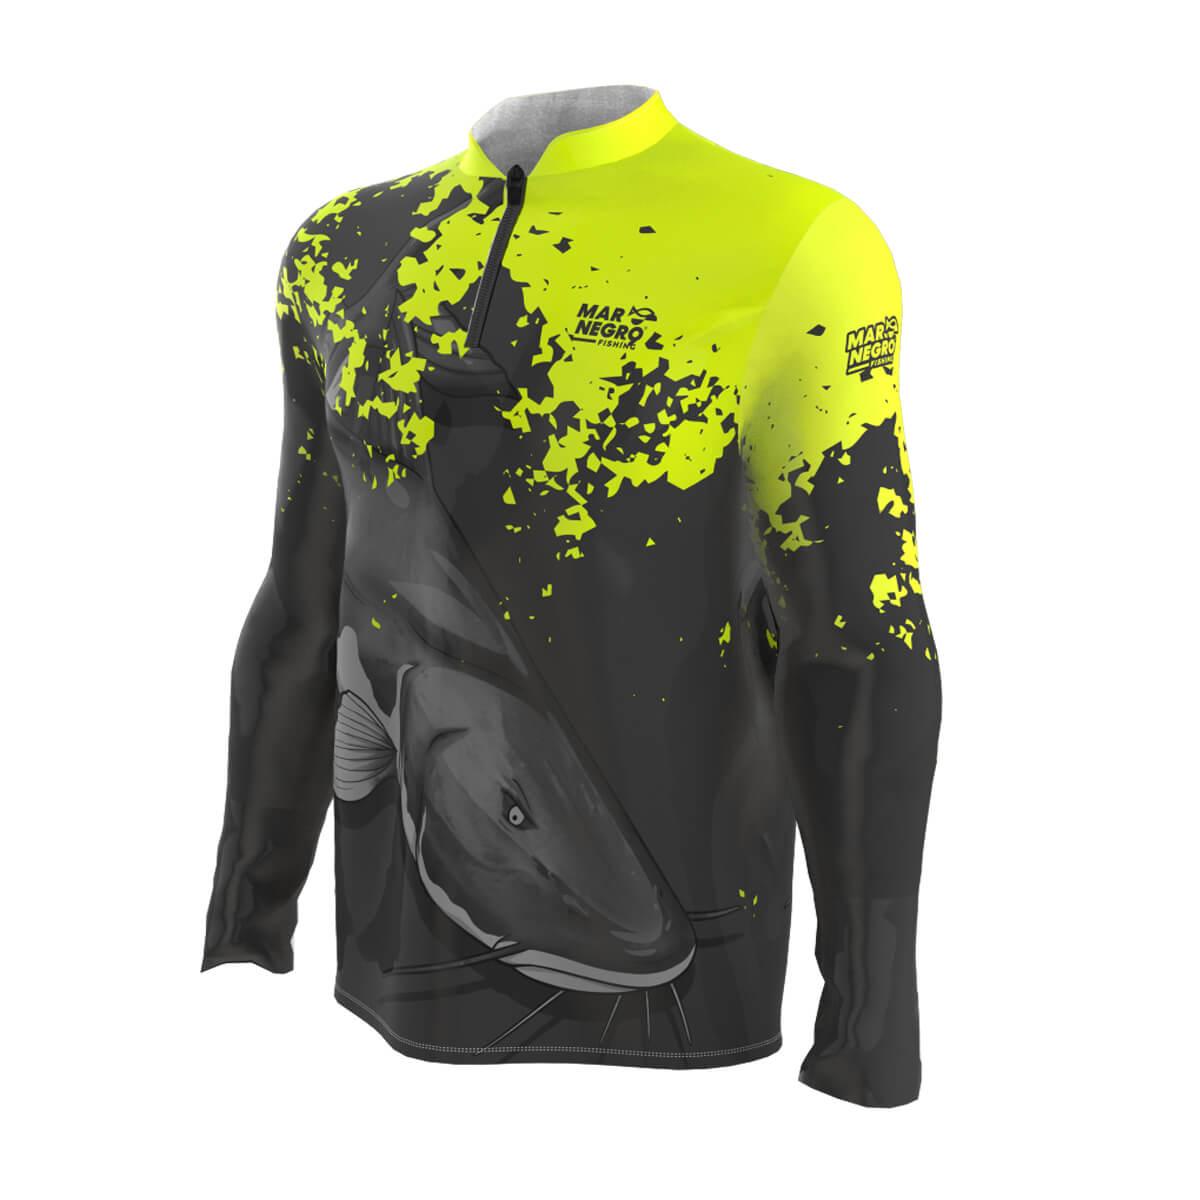 Camiseta Mar Negro 2021 Piraiba  - Pró Pesca Shop